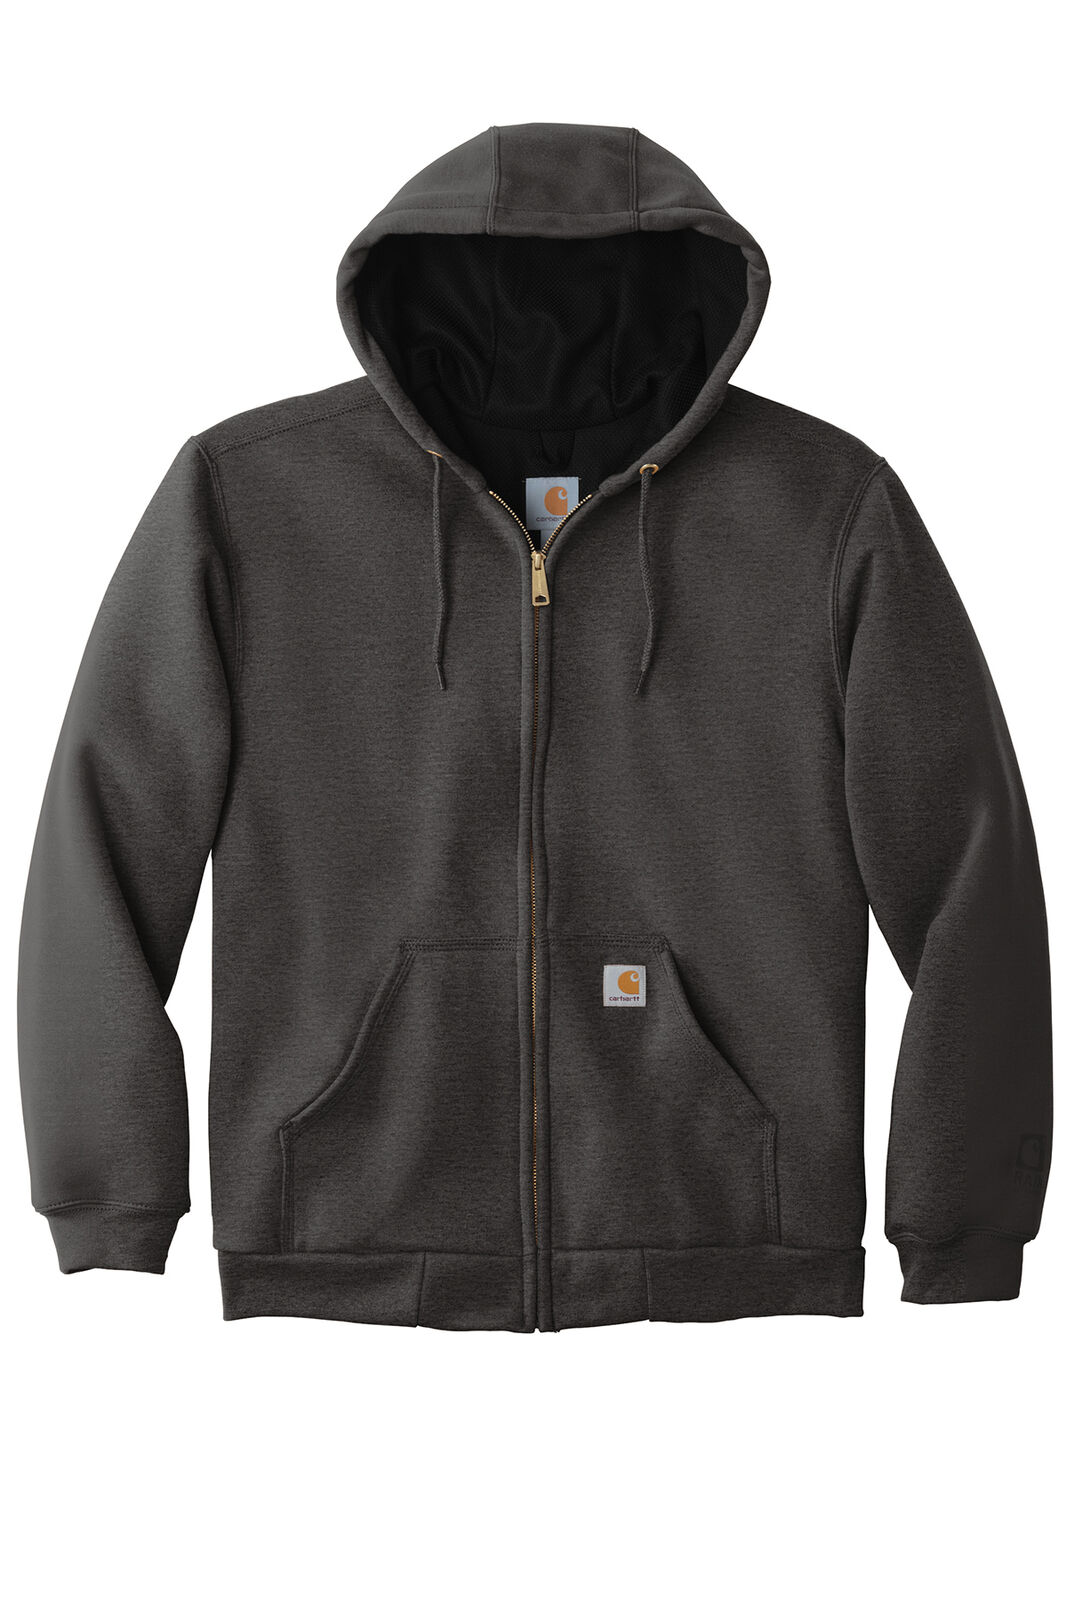 Carhartt Rain Defender Rutland Thermal Lined Zip Sweatshirt Black RN14806